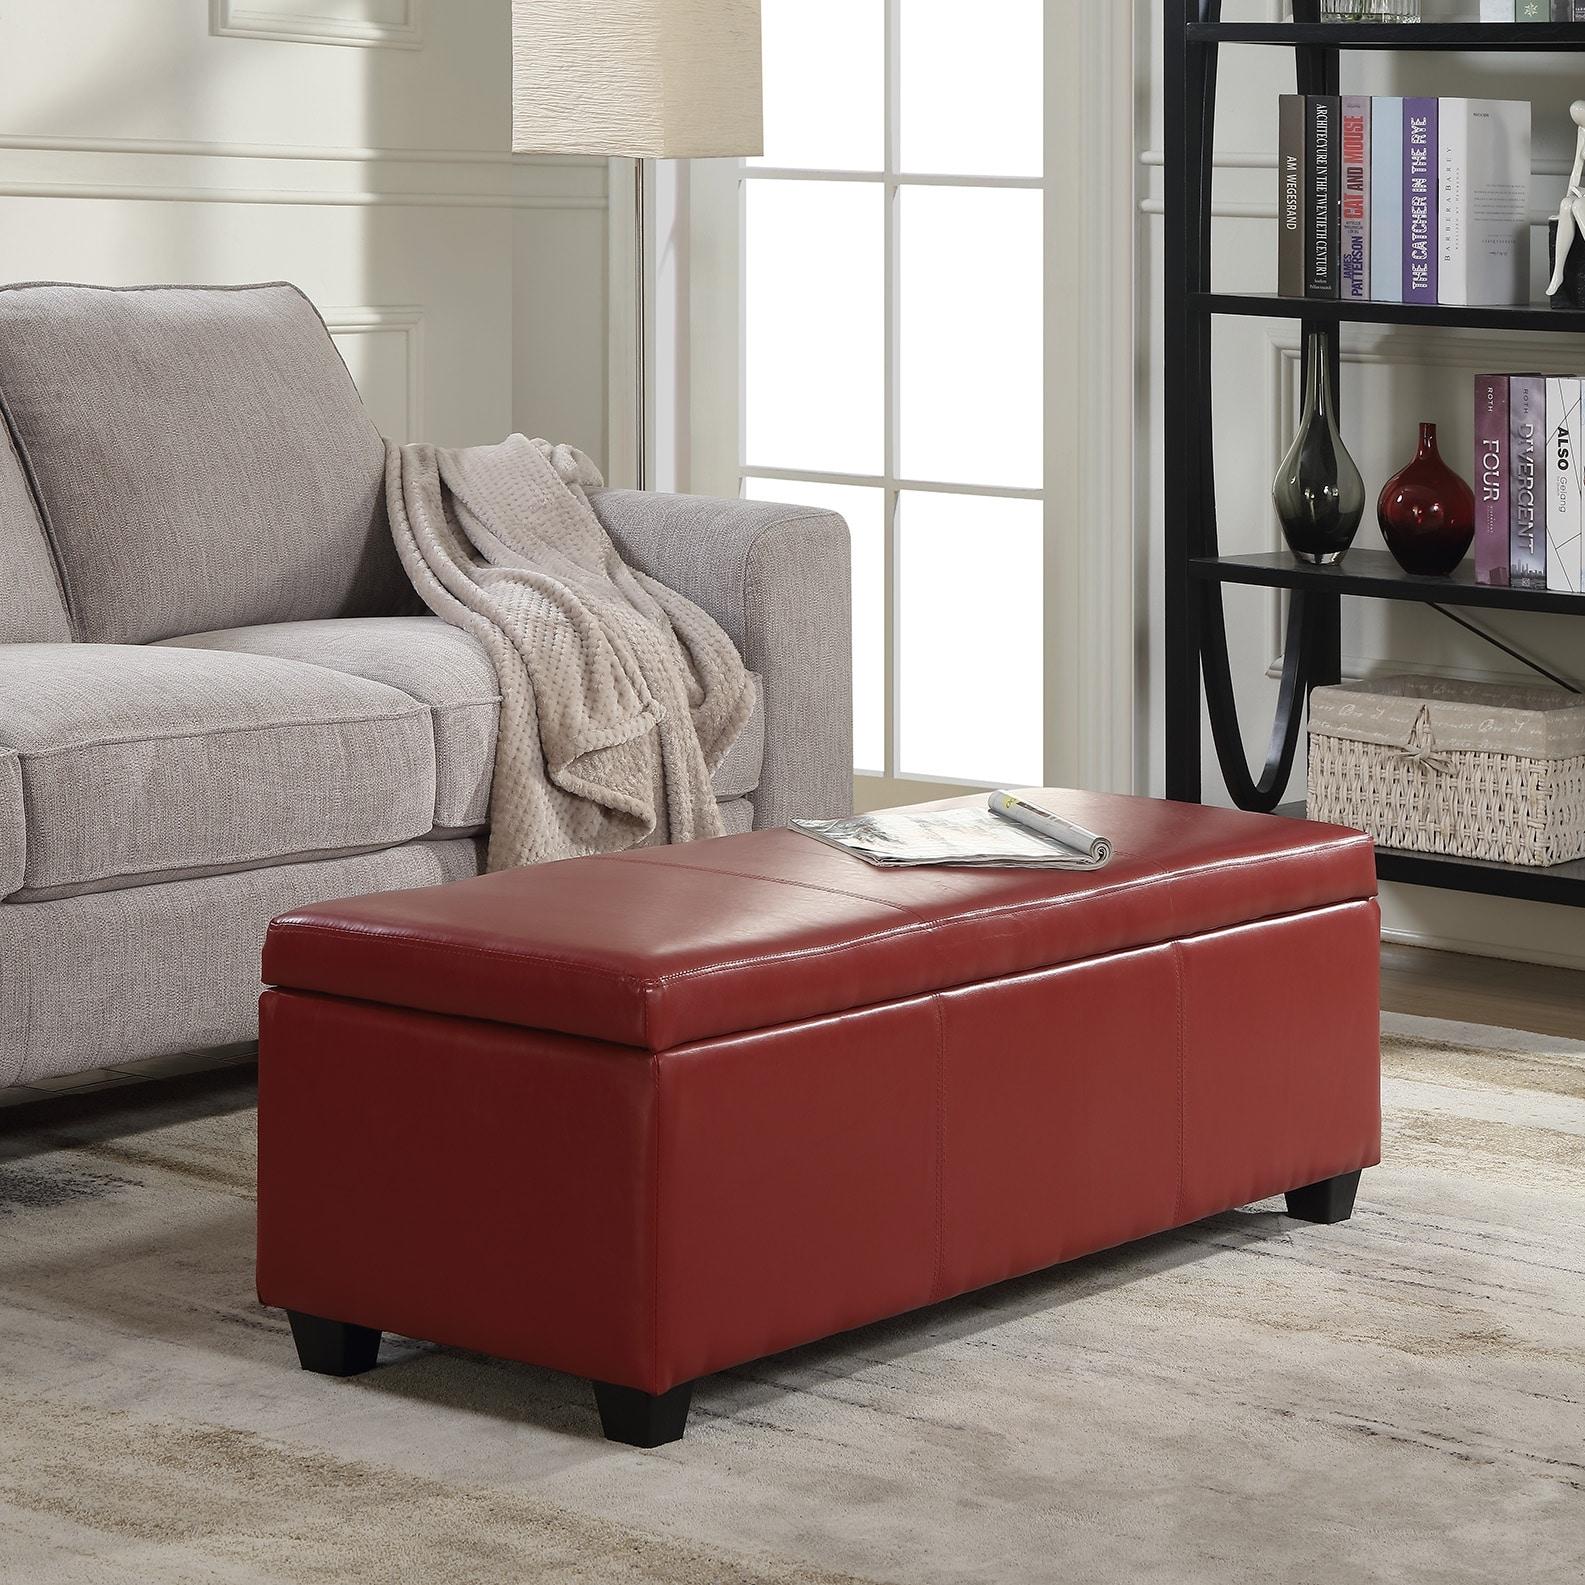 belleze modern elegant ottoman storage bench faux leather linen 48 standard